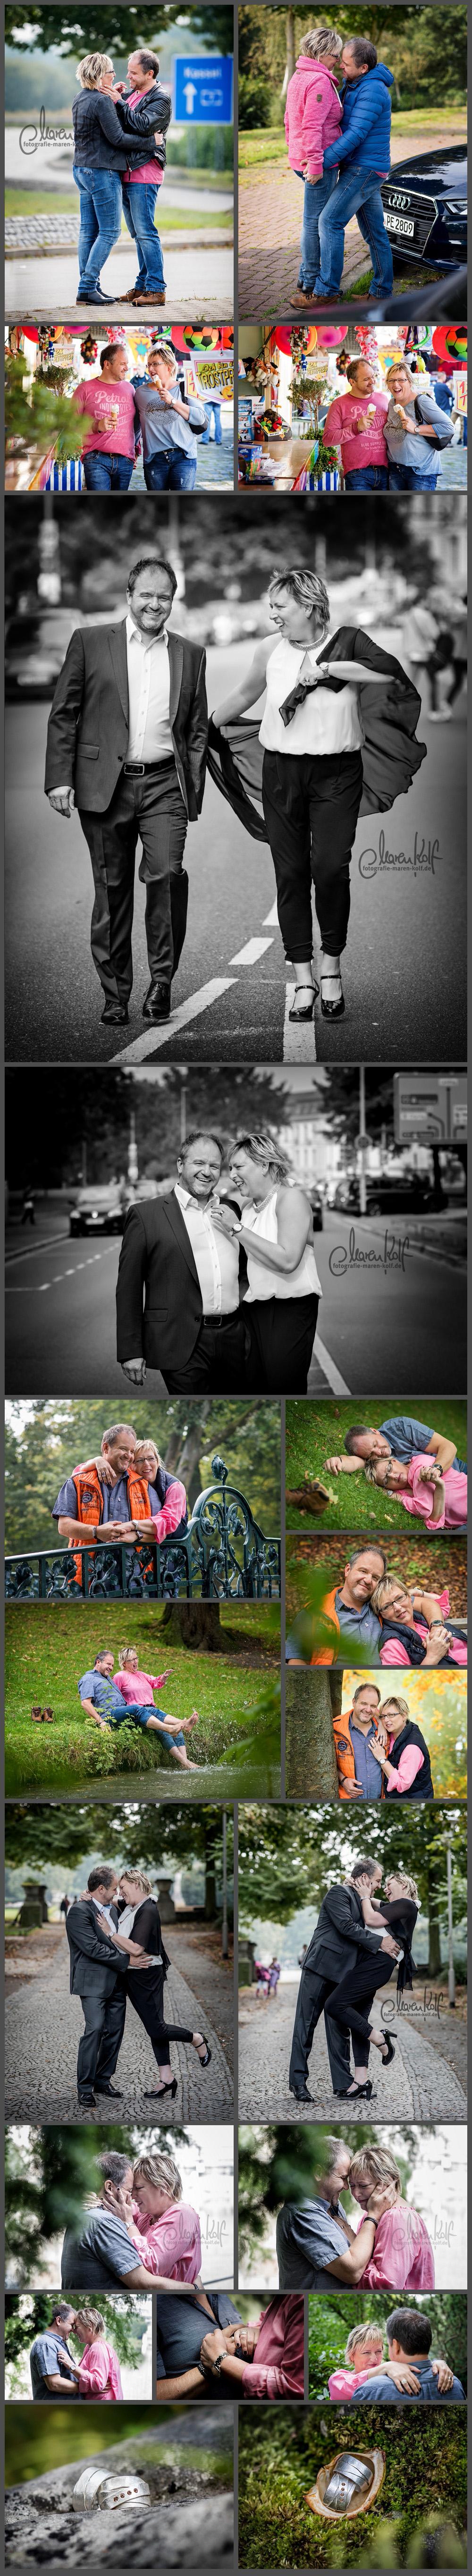 portraitfotografie-reife-liebe-maren-kolf-fotografie-wedemark-hannover-maschpark-heiratsantrag-blog